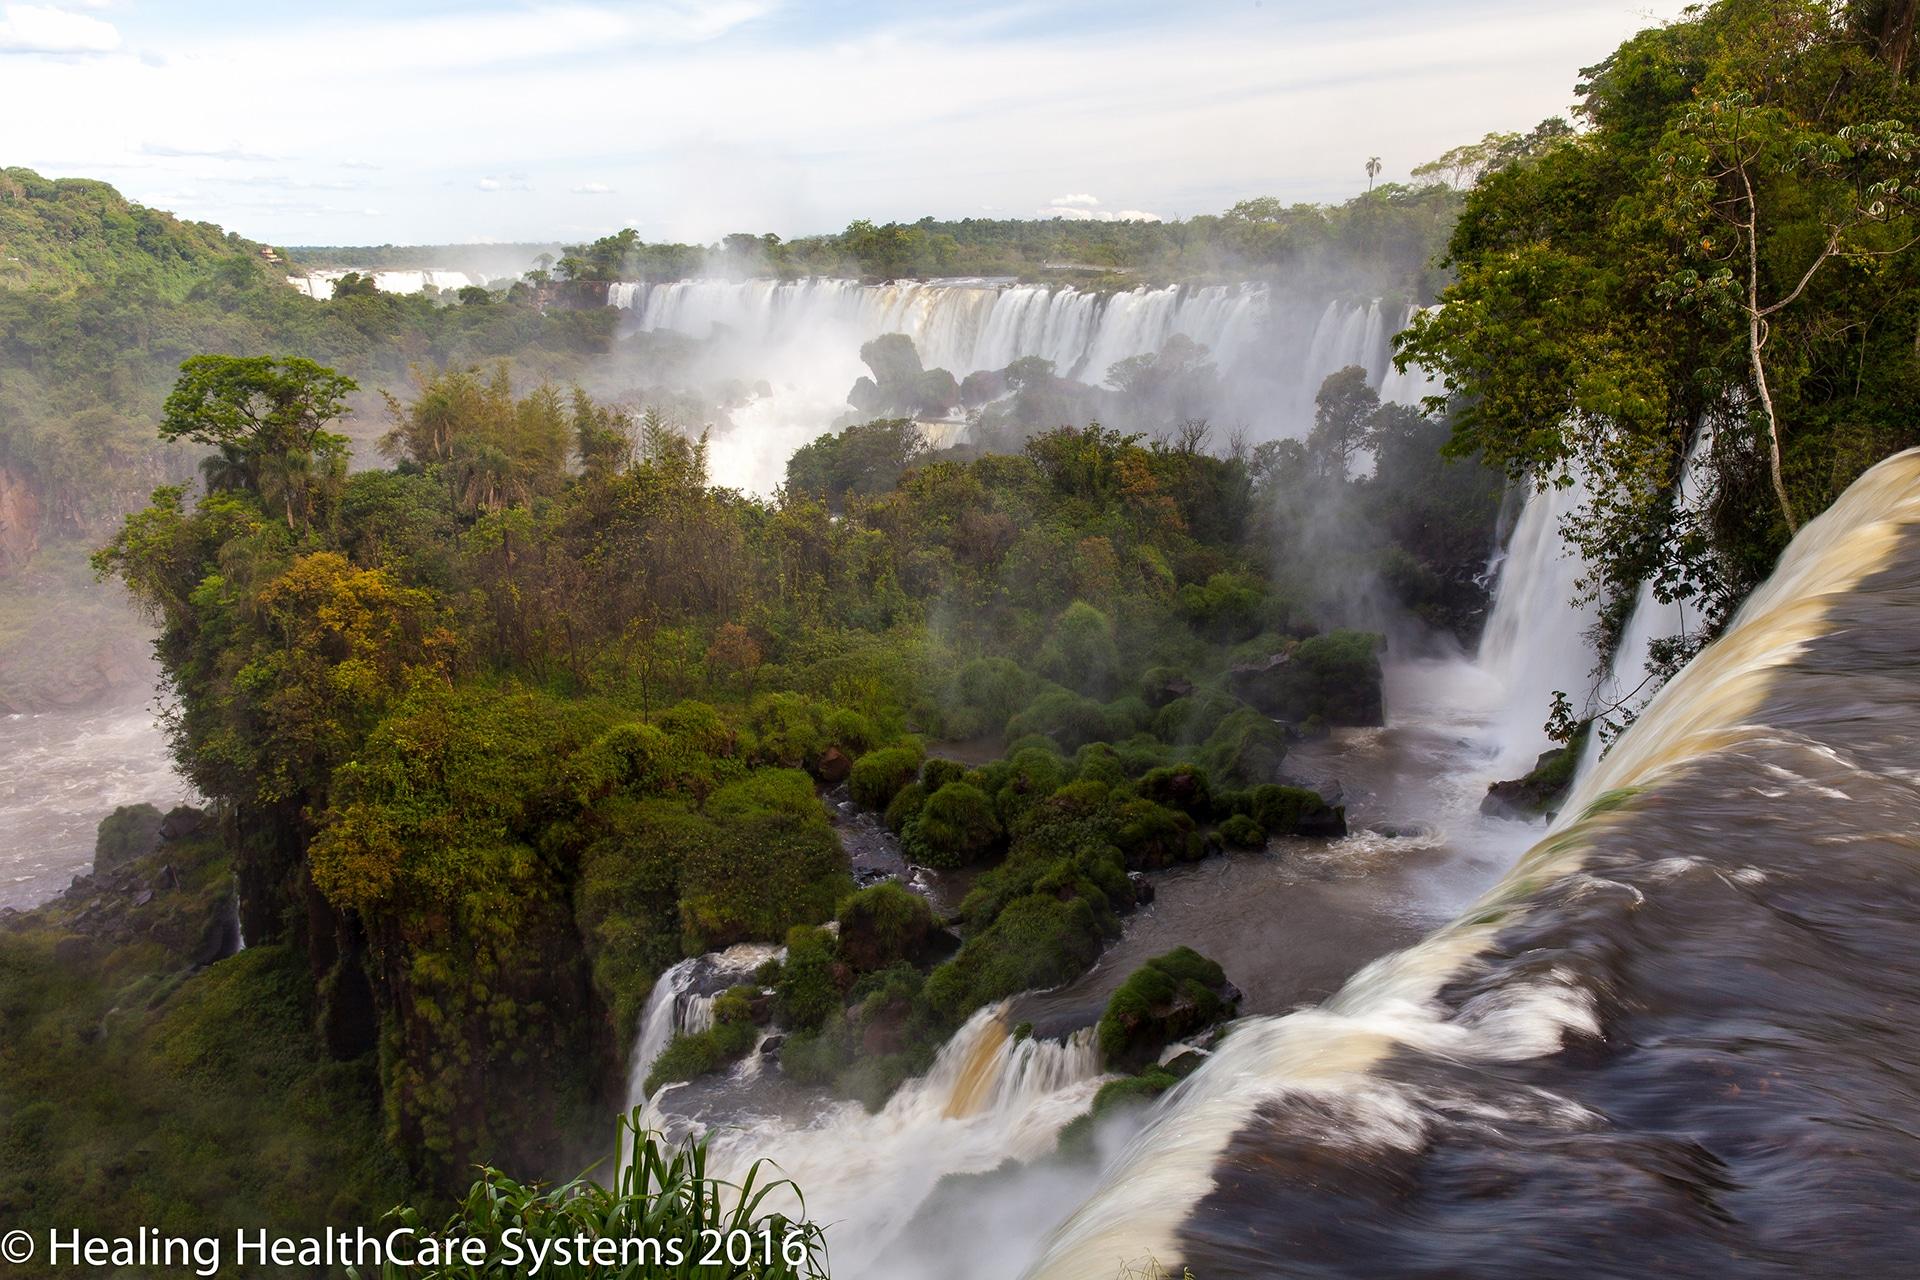 Patagonia South America >> Iguazu Falls - C.A.R.E. Channel - Healing HealthCare Systems